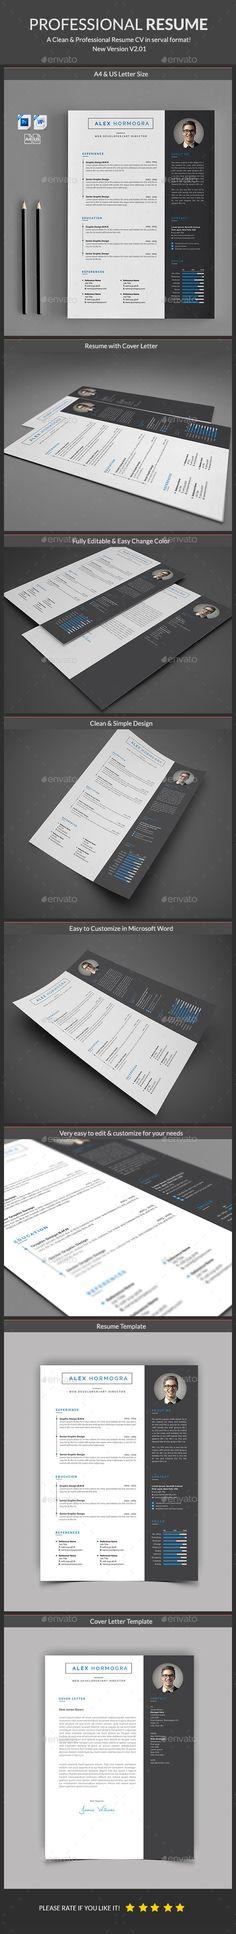 Resume Resume cv, Cv template and Resume ideas - visual resume template